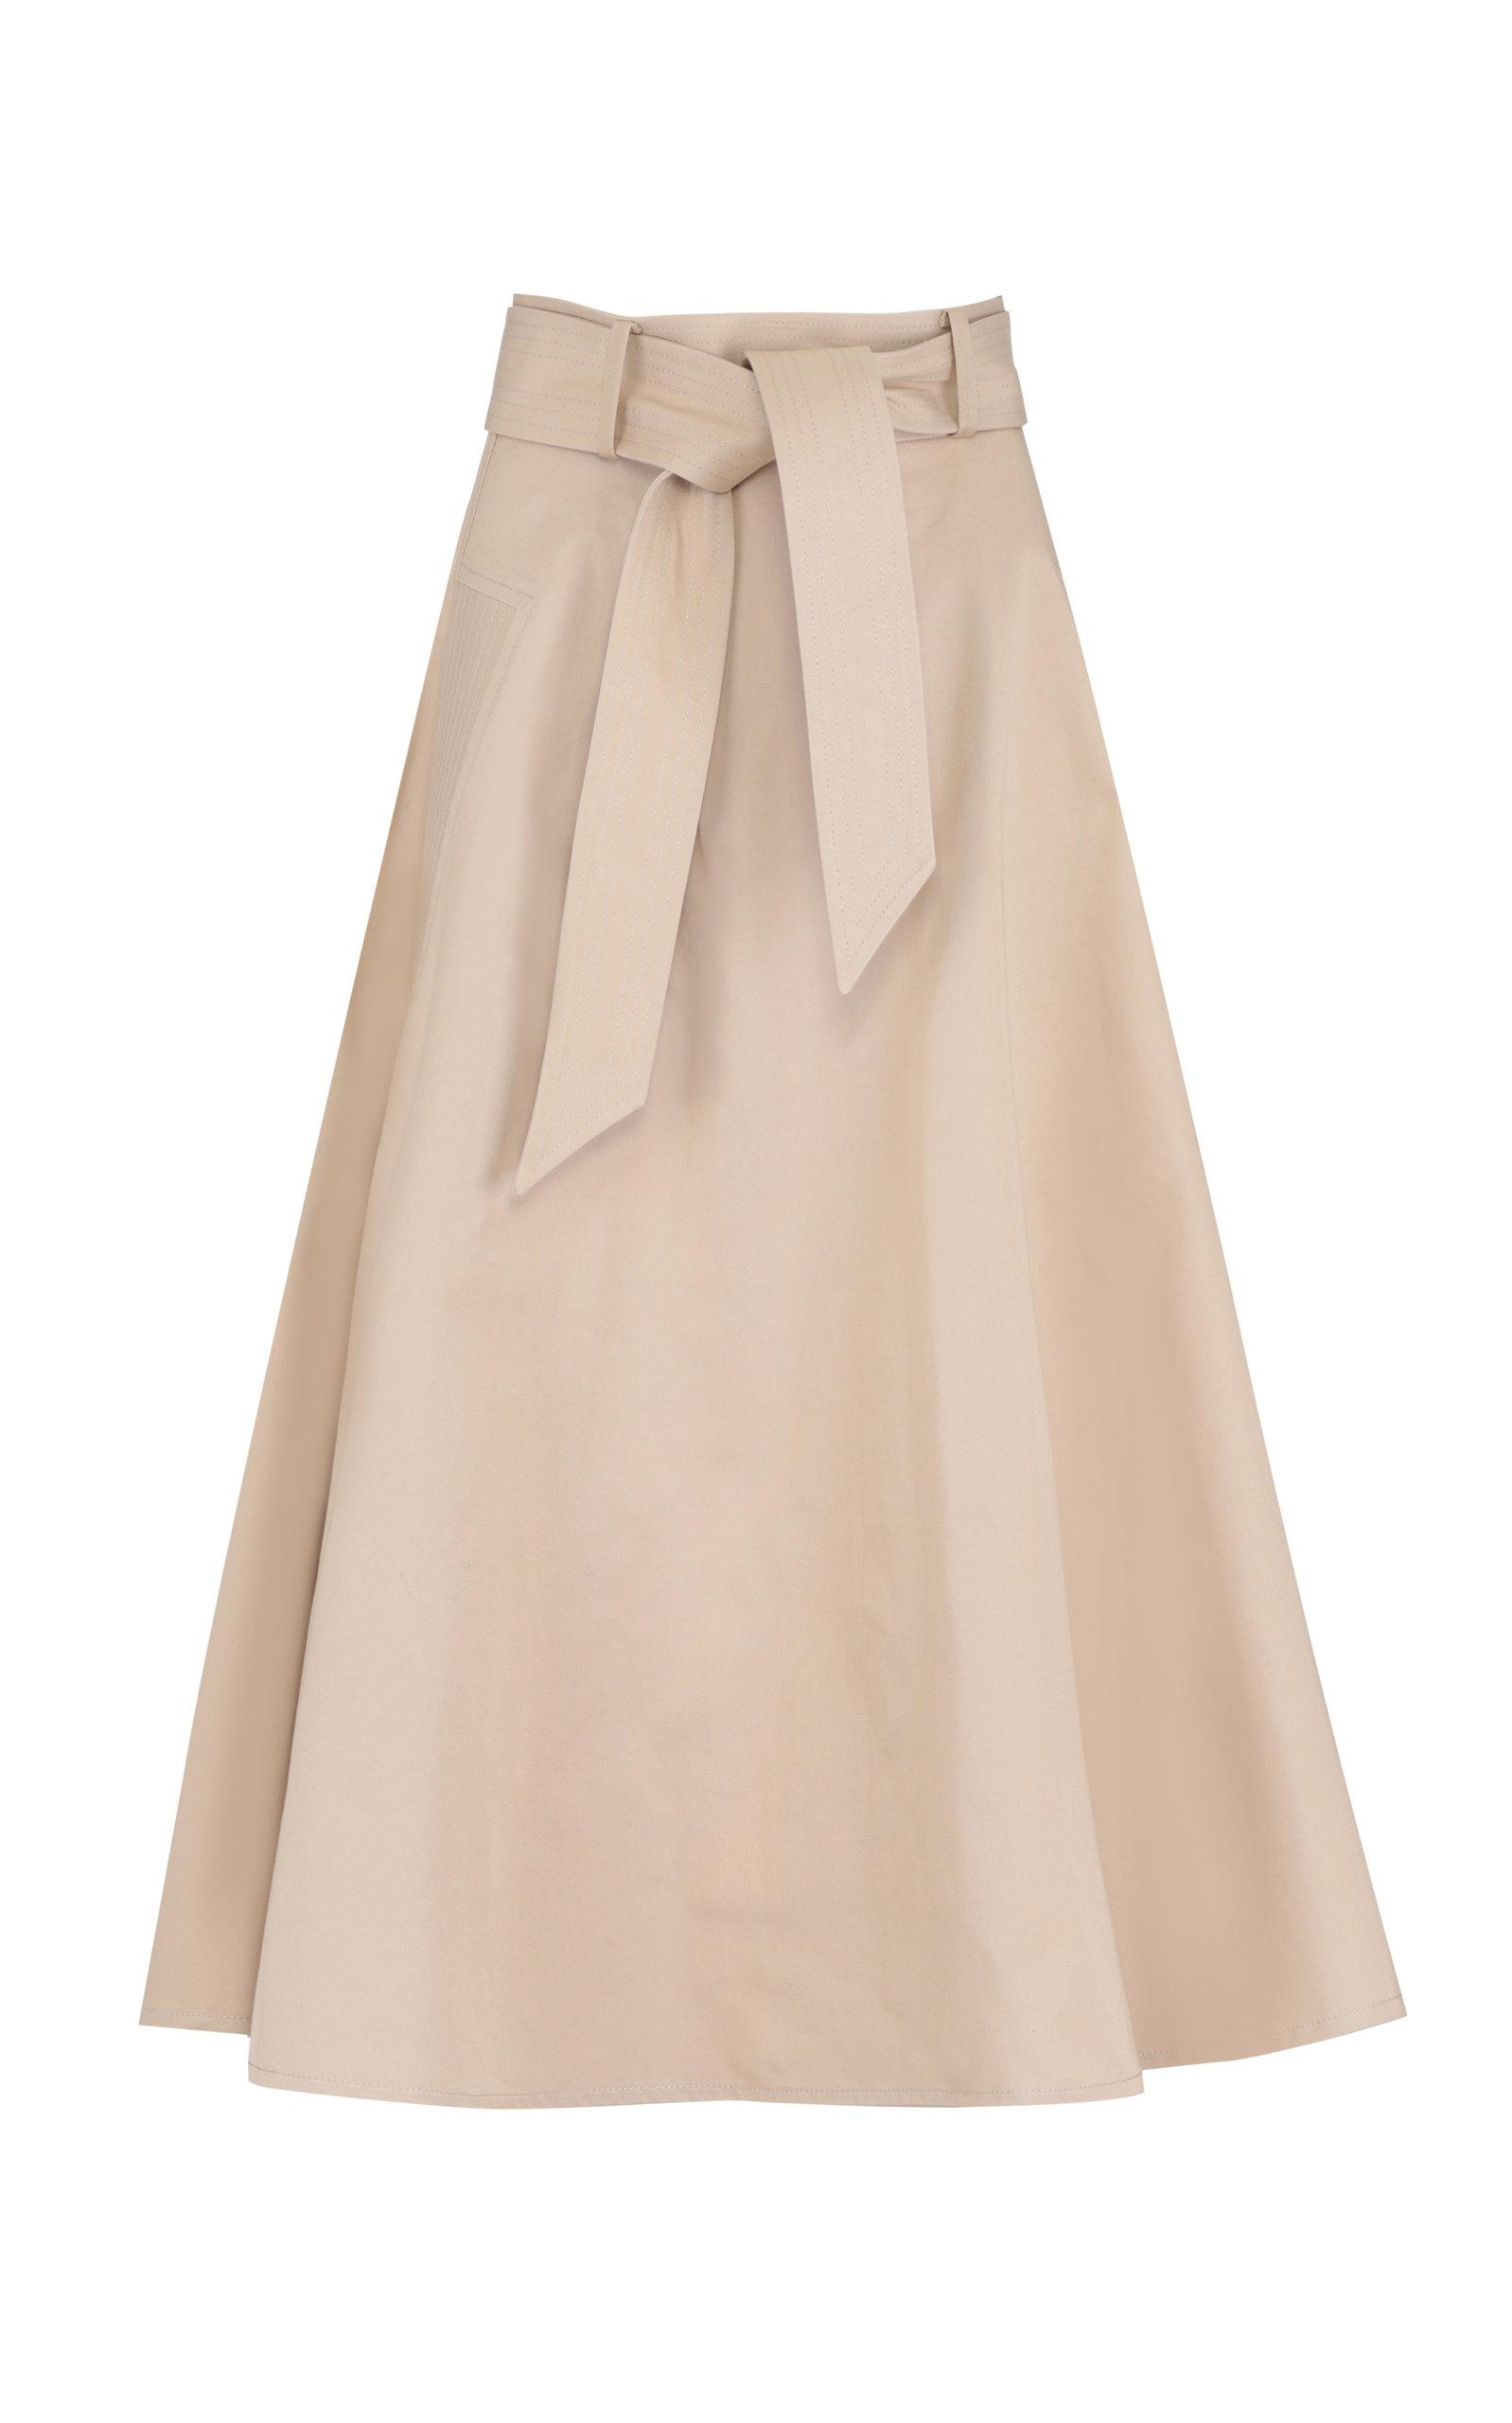 Martin Grant Belted Cotton Midi Circle Skirt